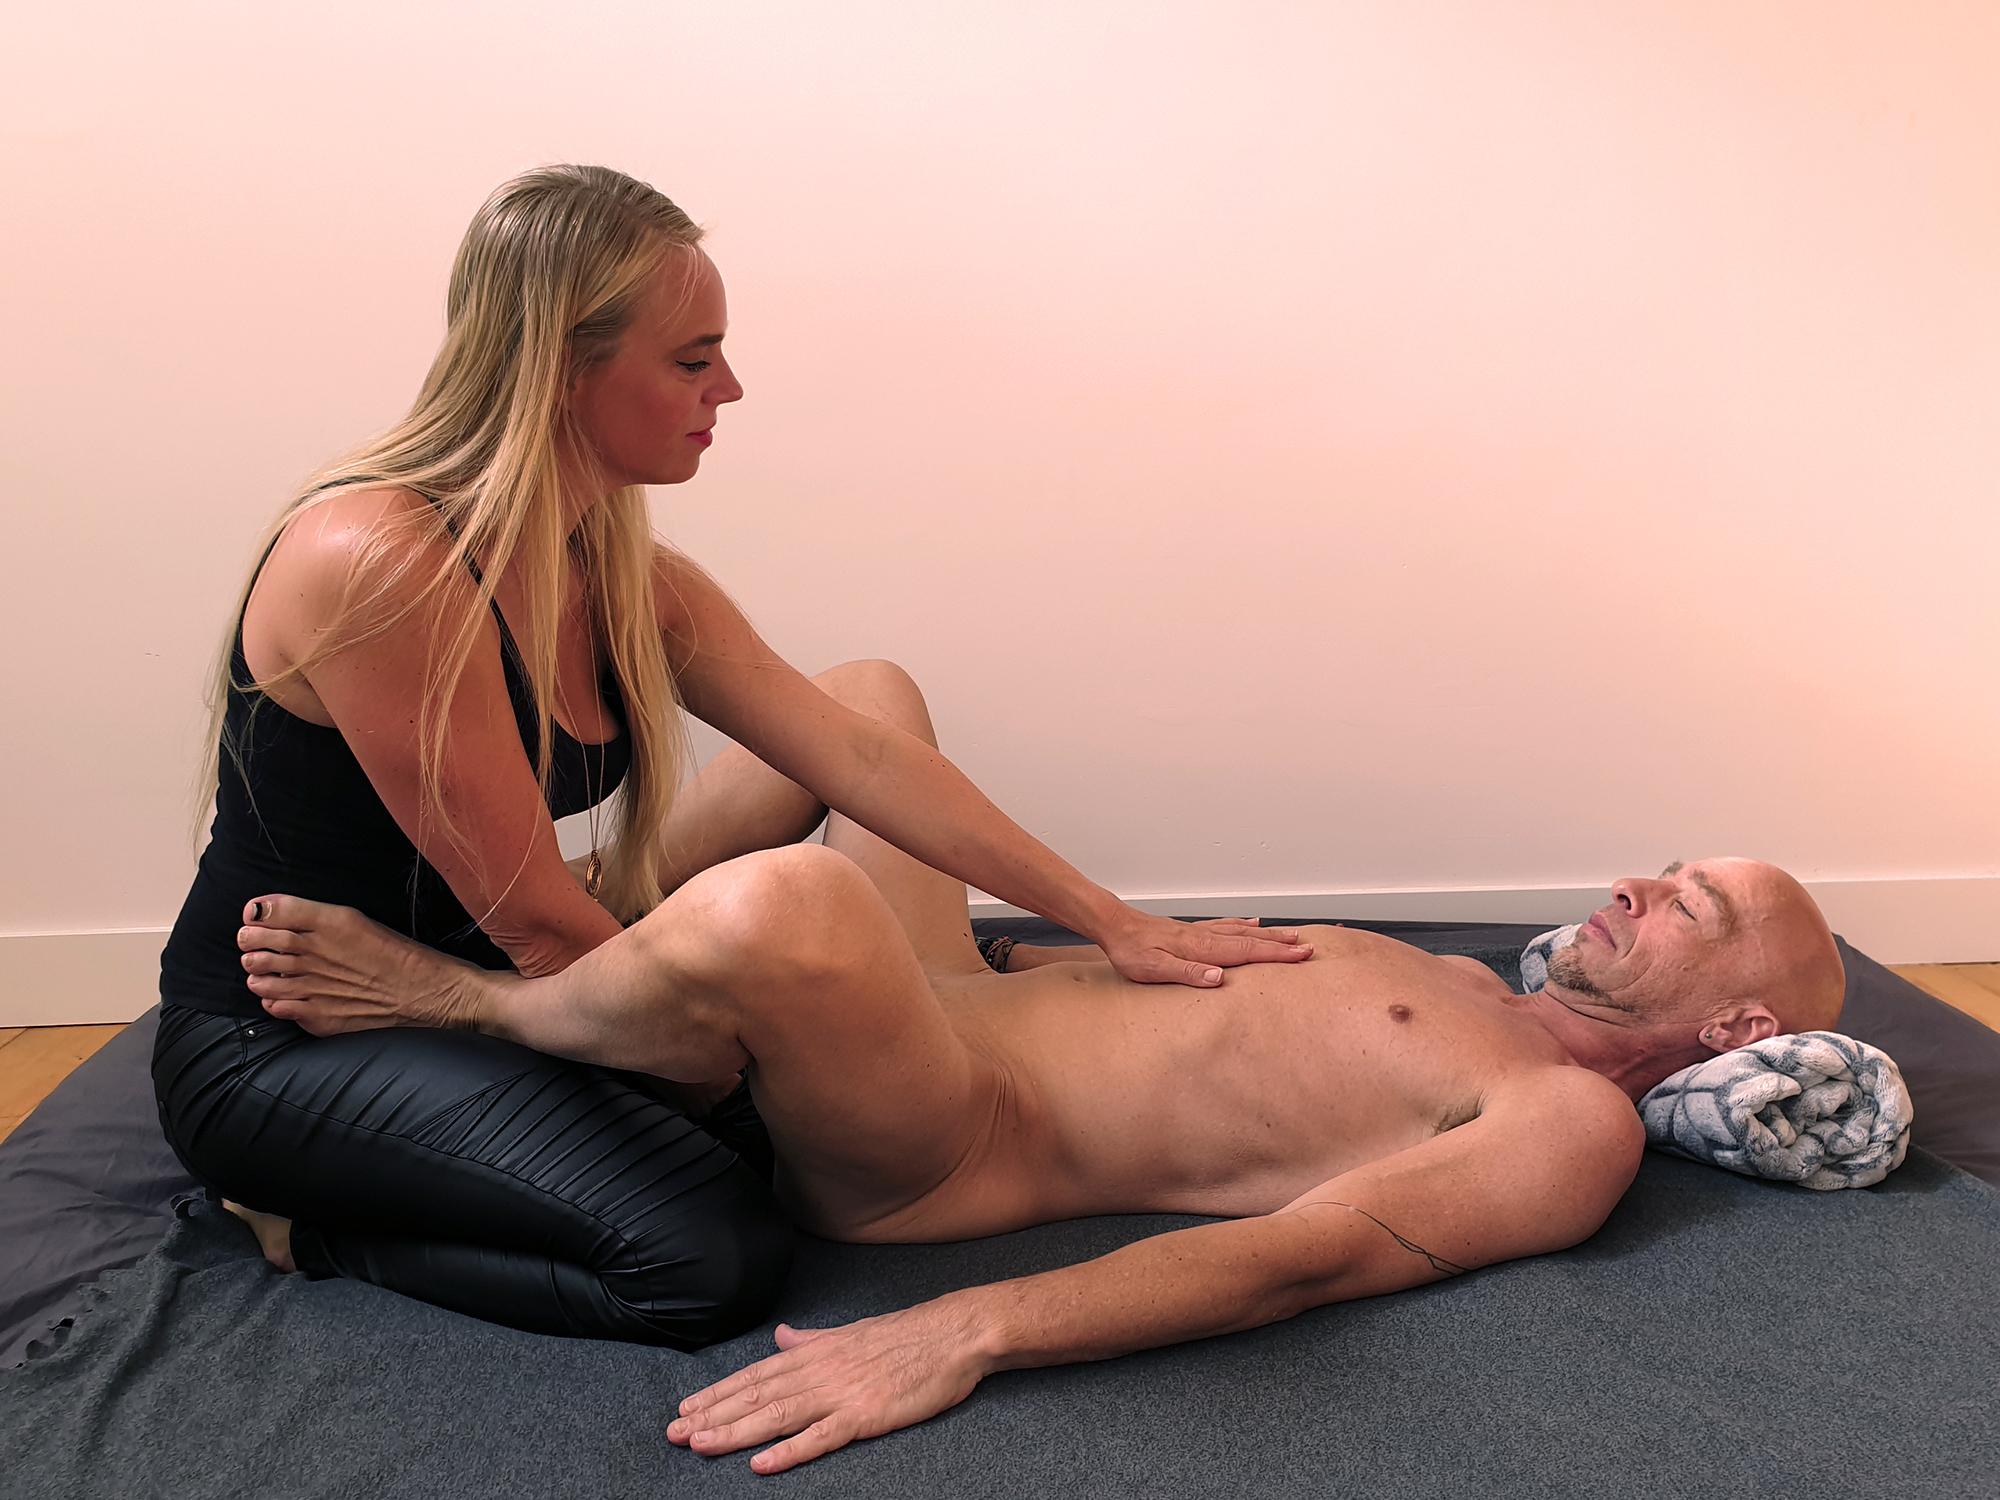 Hotlips having hands on Diesel's belly